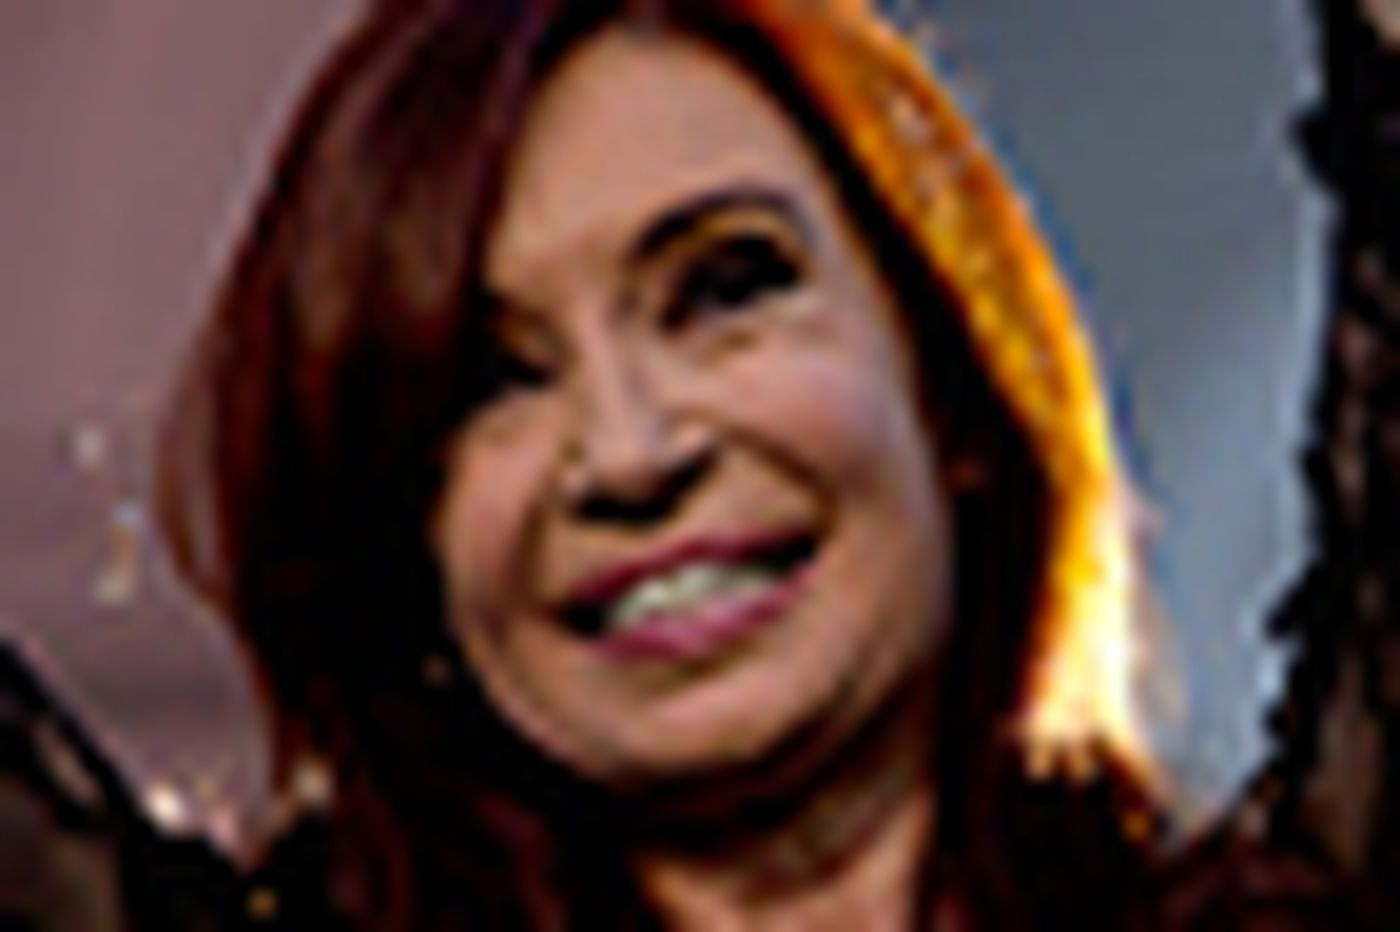 Argentina's Fernandez sworn in for 2d term